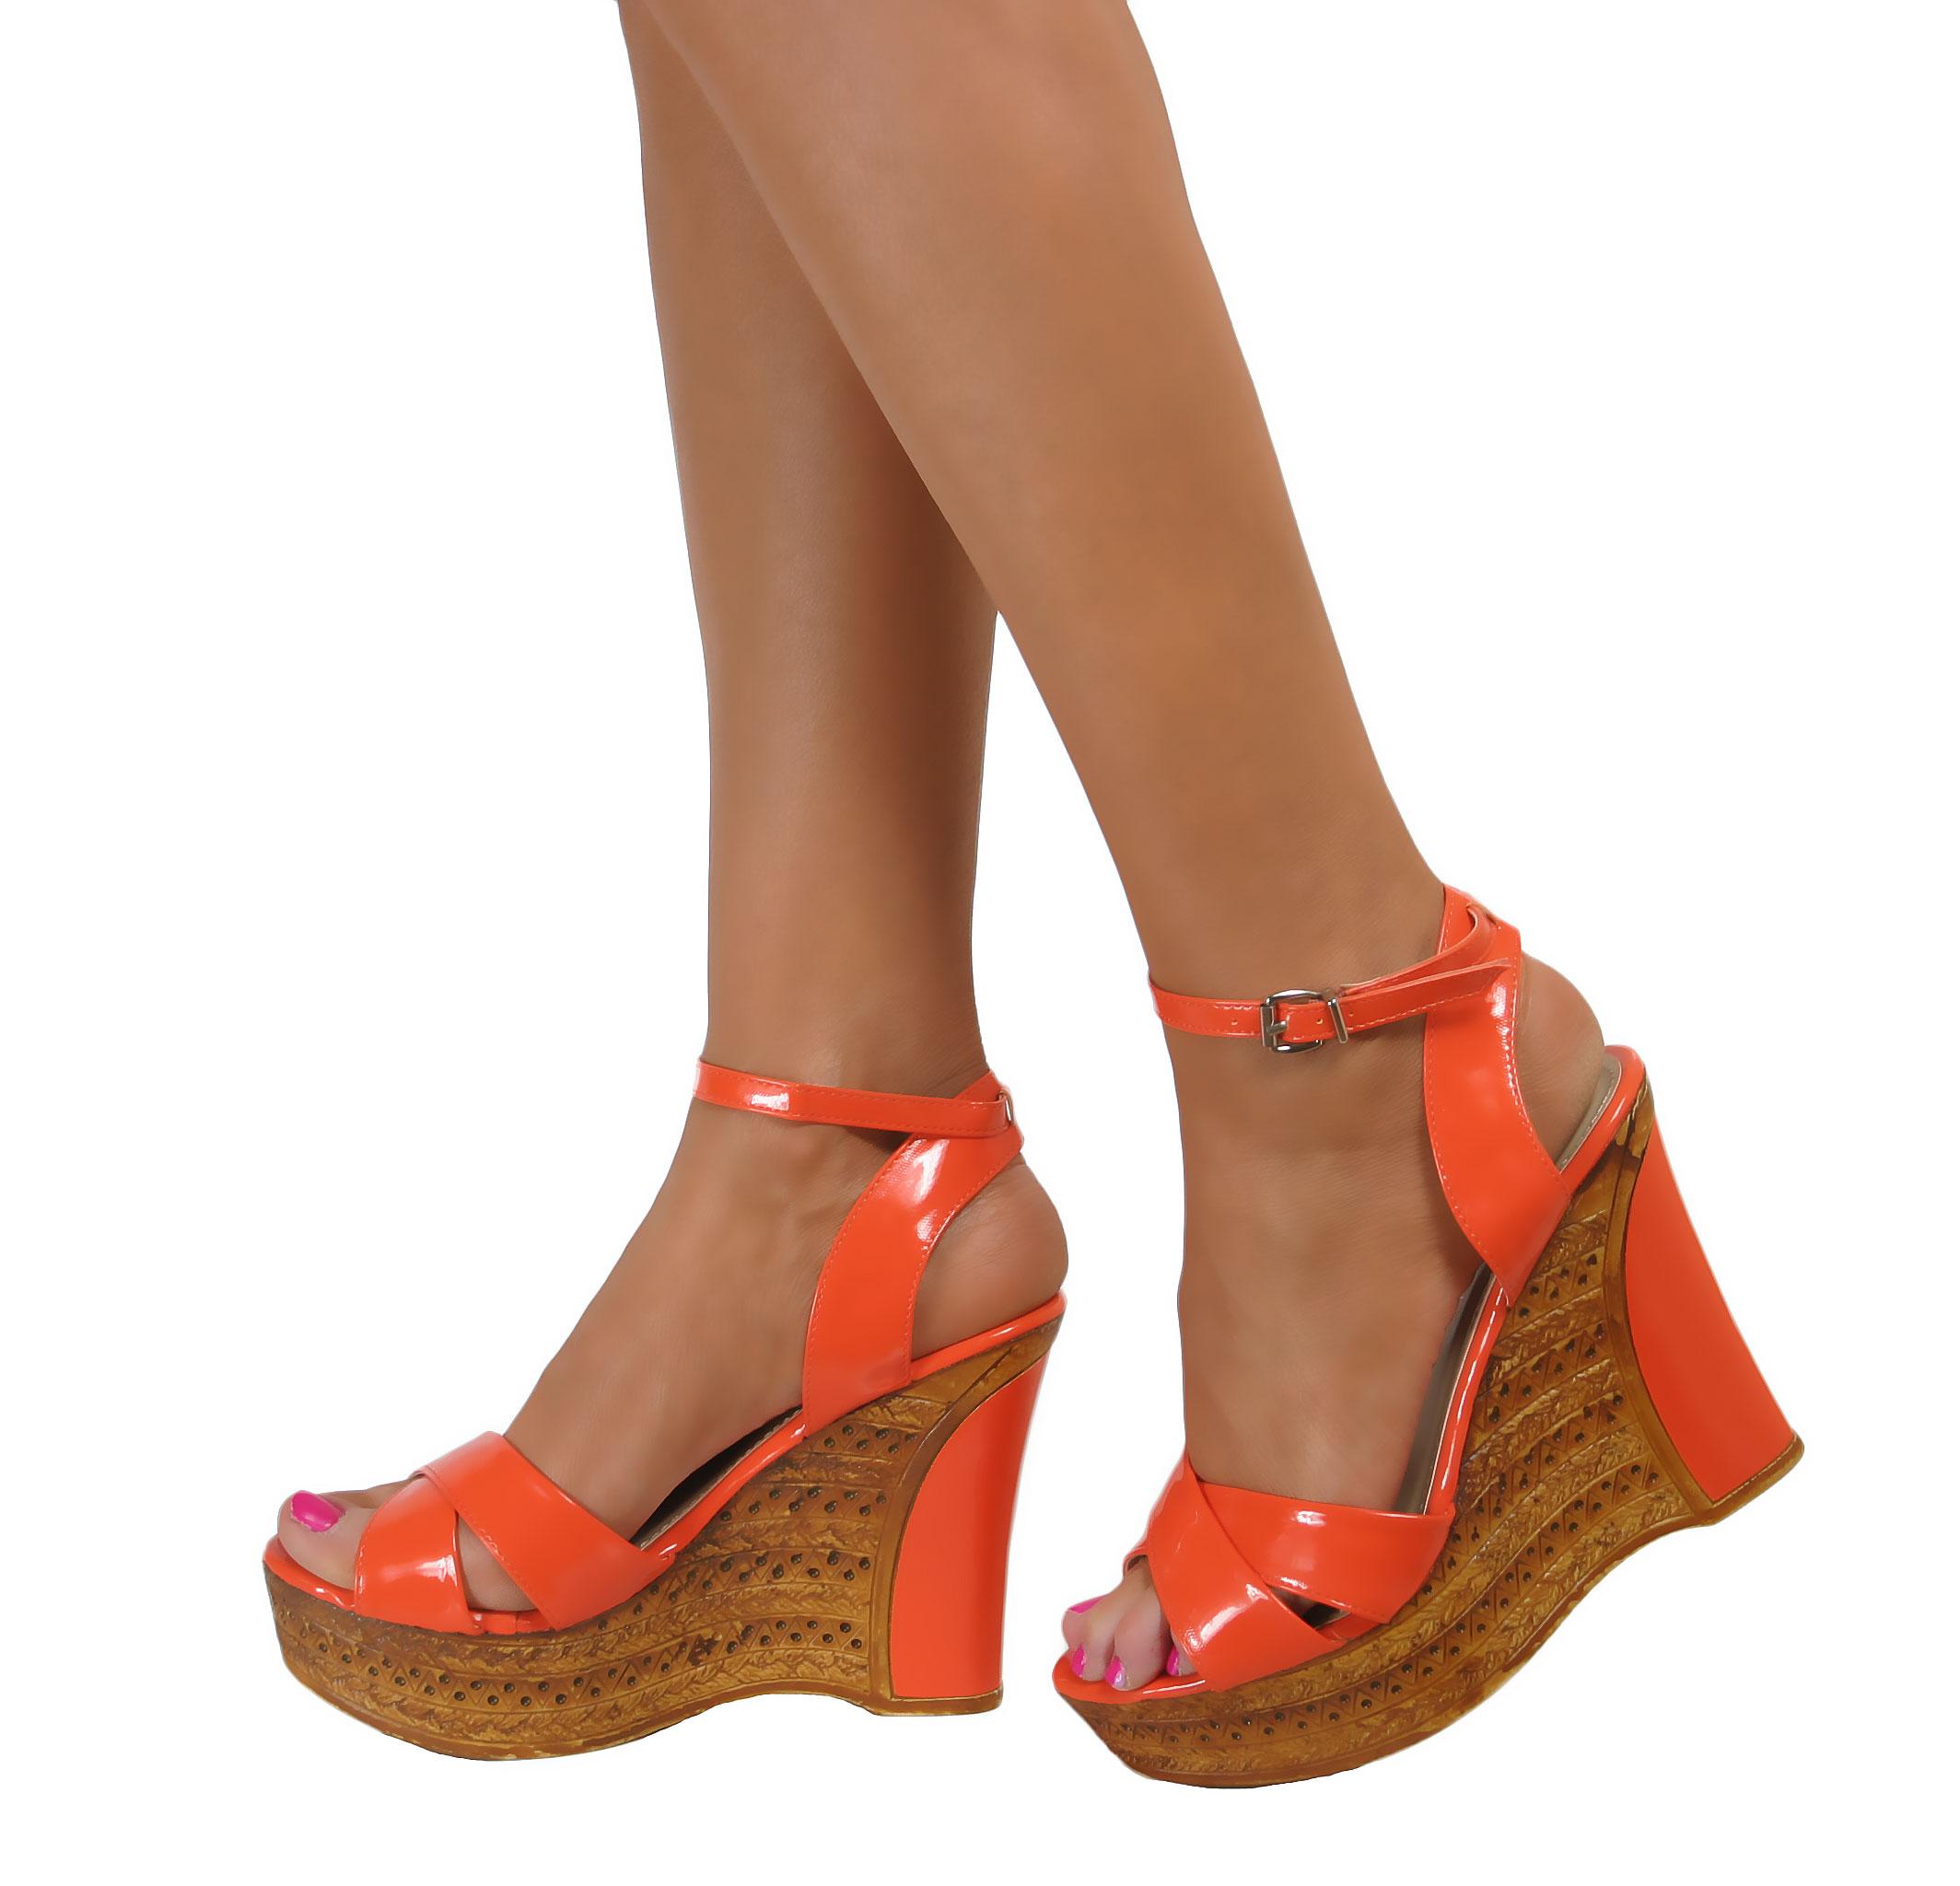 9557d9d7a Ladies Platform Wedge High Heels Strappy Peep Toe Sandals Summer .